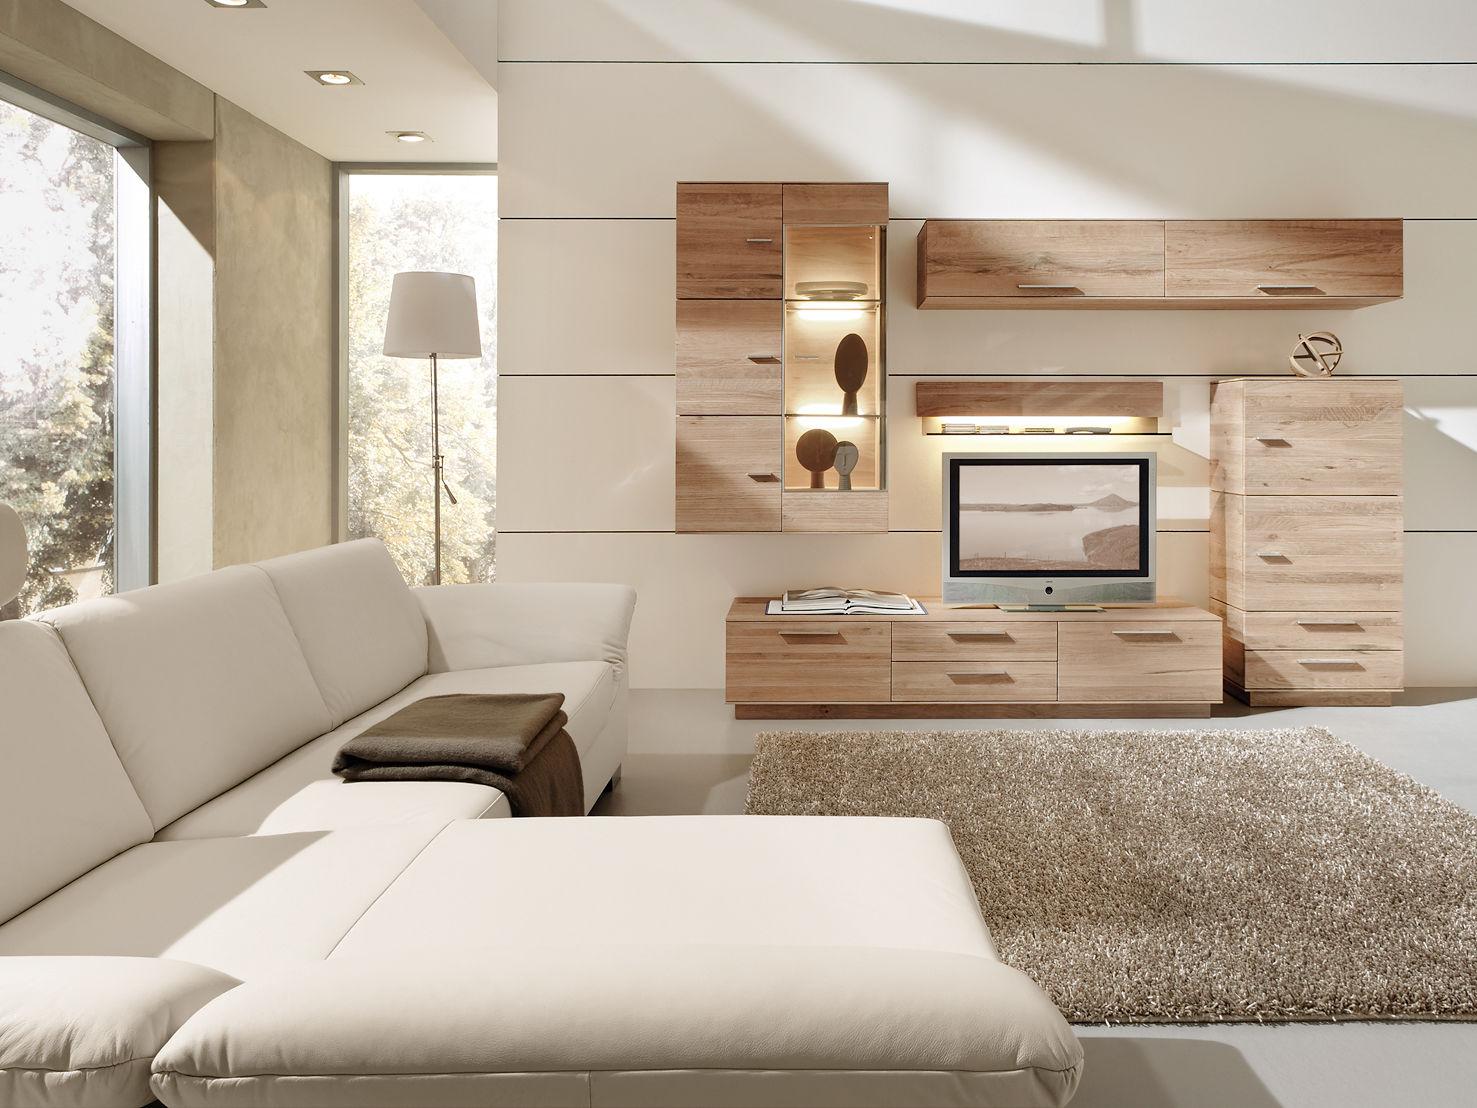 Helles Holz im Trend 6